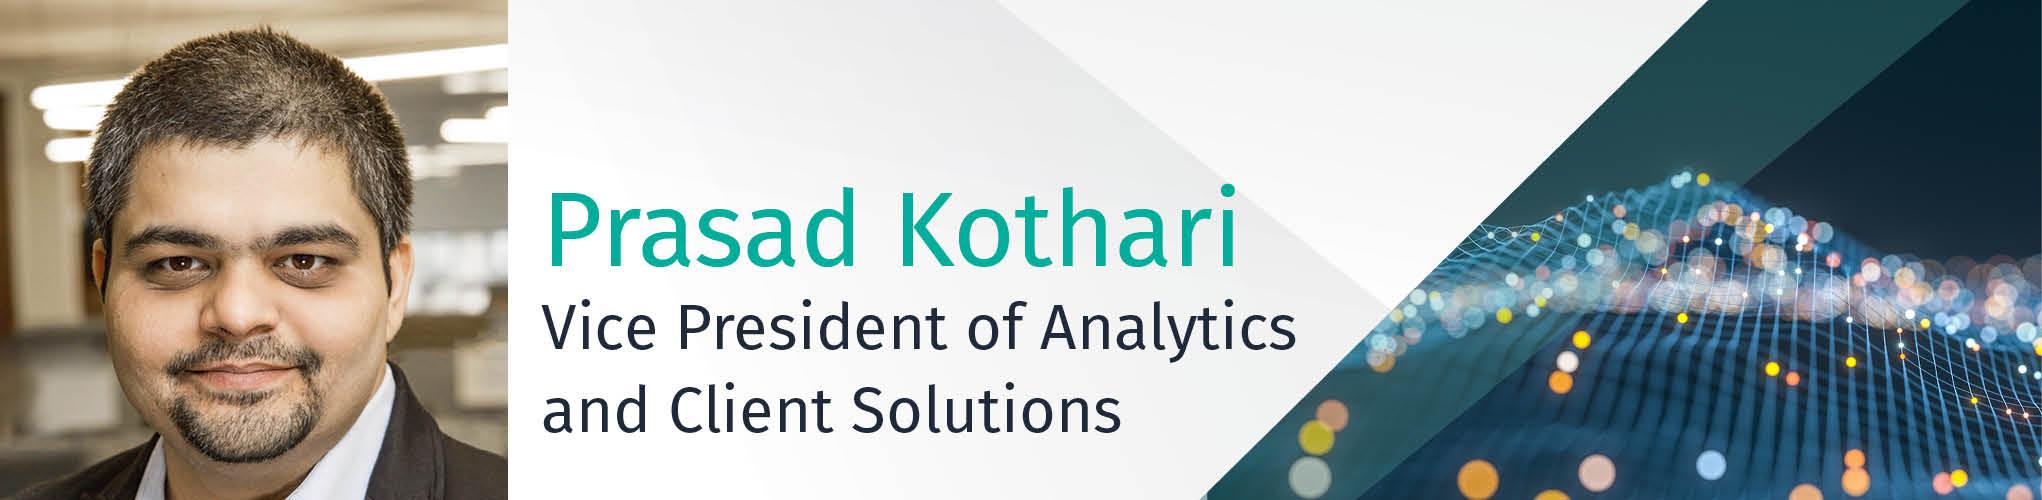 Meet-the-data-scientist_Prasad-Kothari